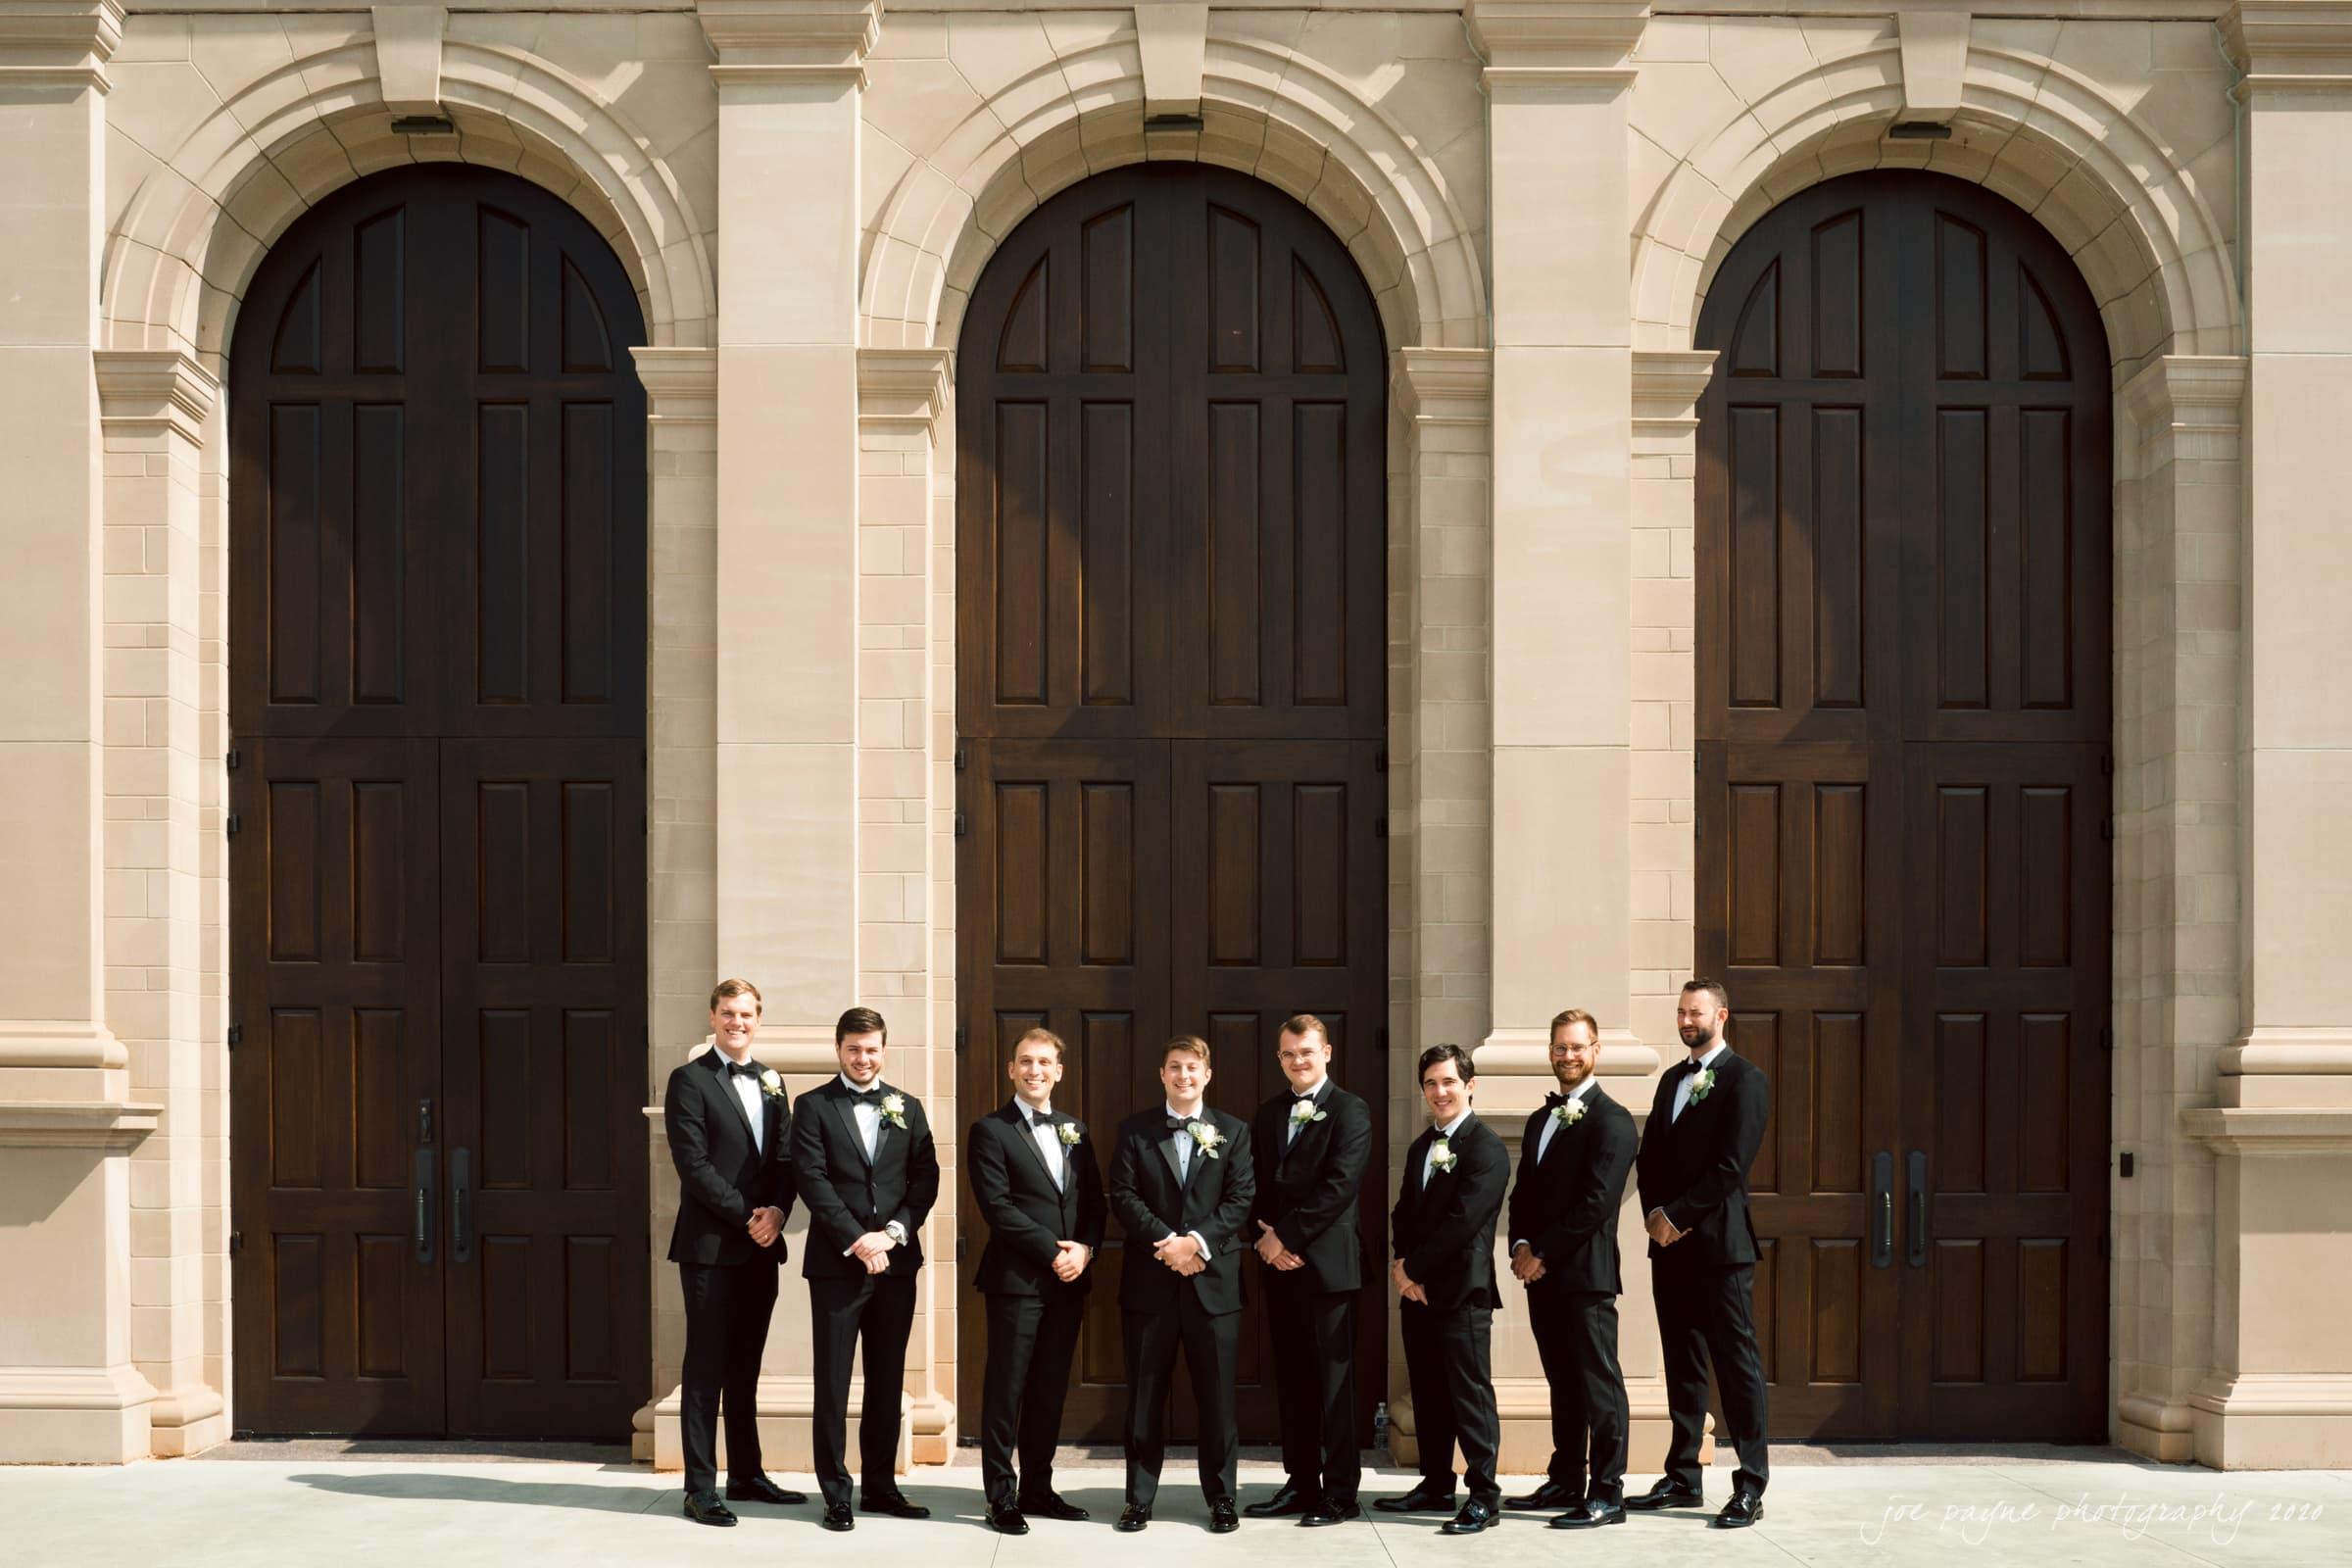 holy name of jesus & angus barn wedding - groom & groomsmen façade